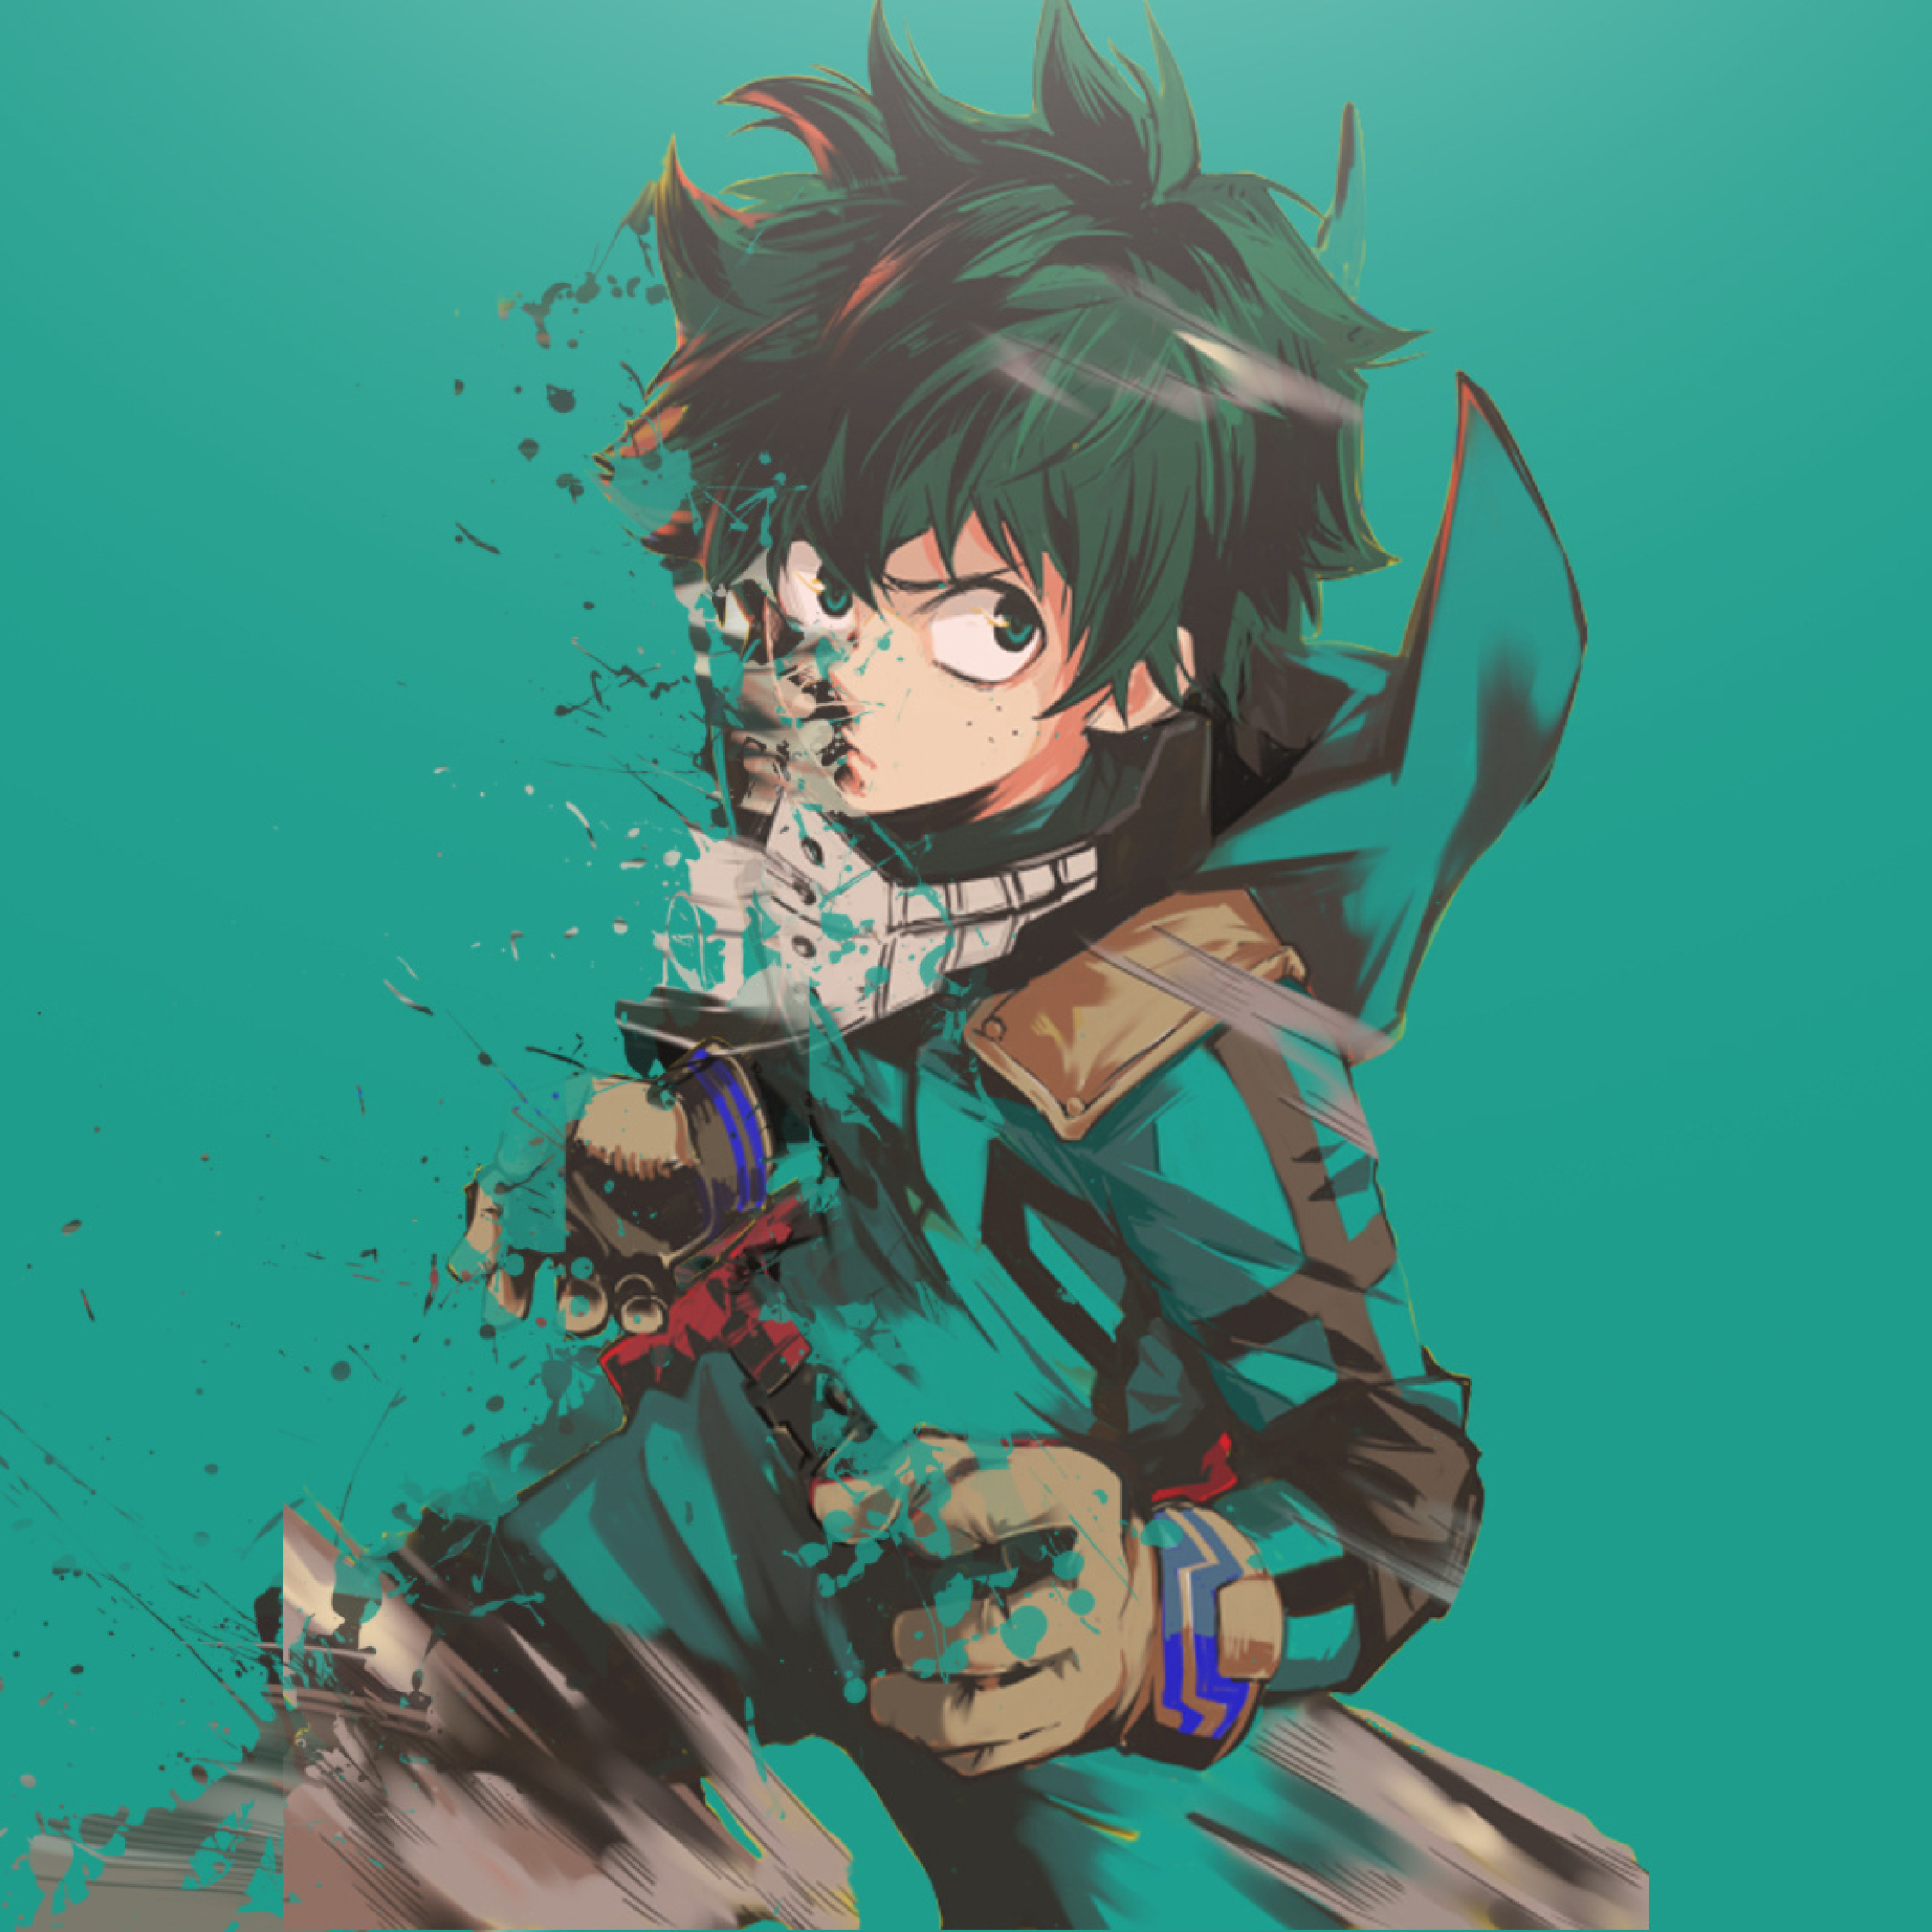 Manga Images Diamond No Ace Hd Wallpaper And Background: Boku No Hero Academia Midoriya Izuku Art, Full HD Wallpaper